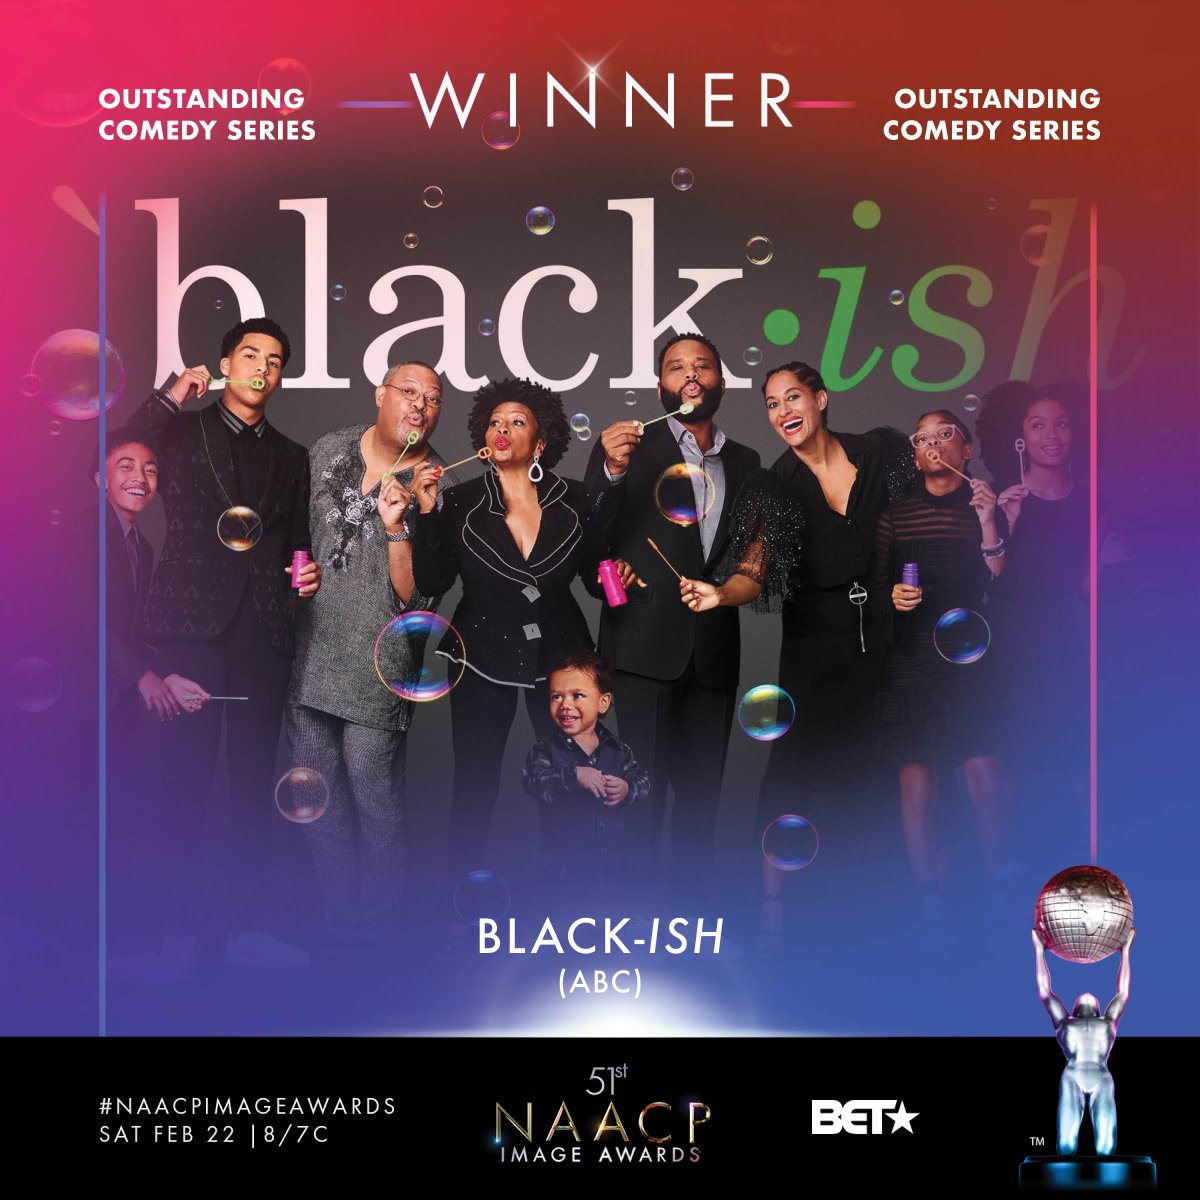 Congrats Outstanding Comedy Series winner - @blackishabc  #NAACPImageAwards